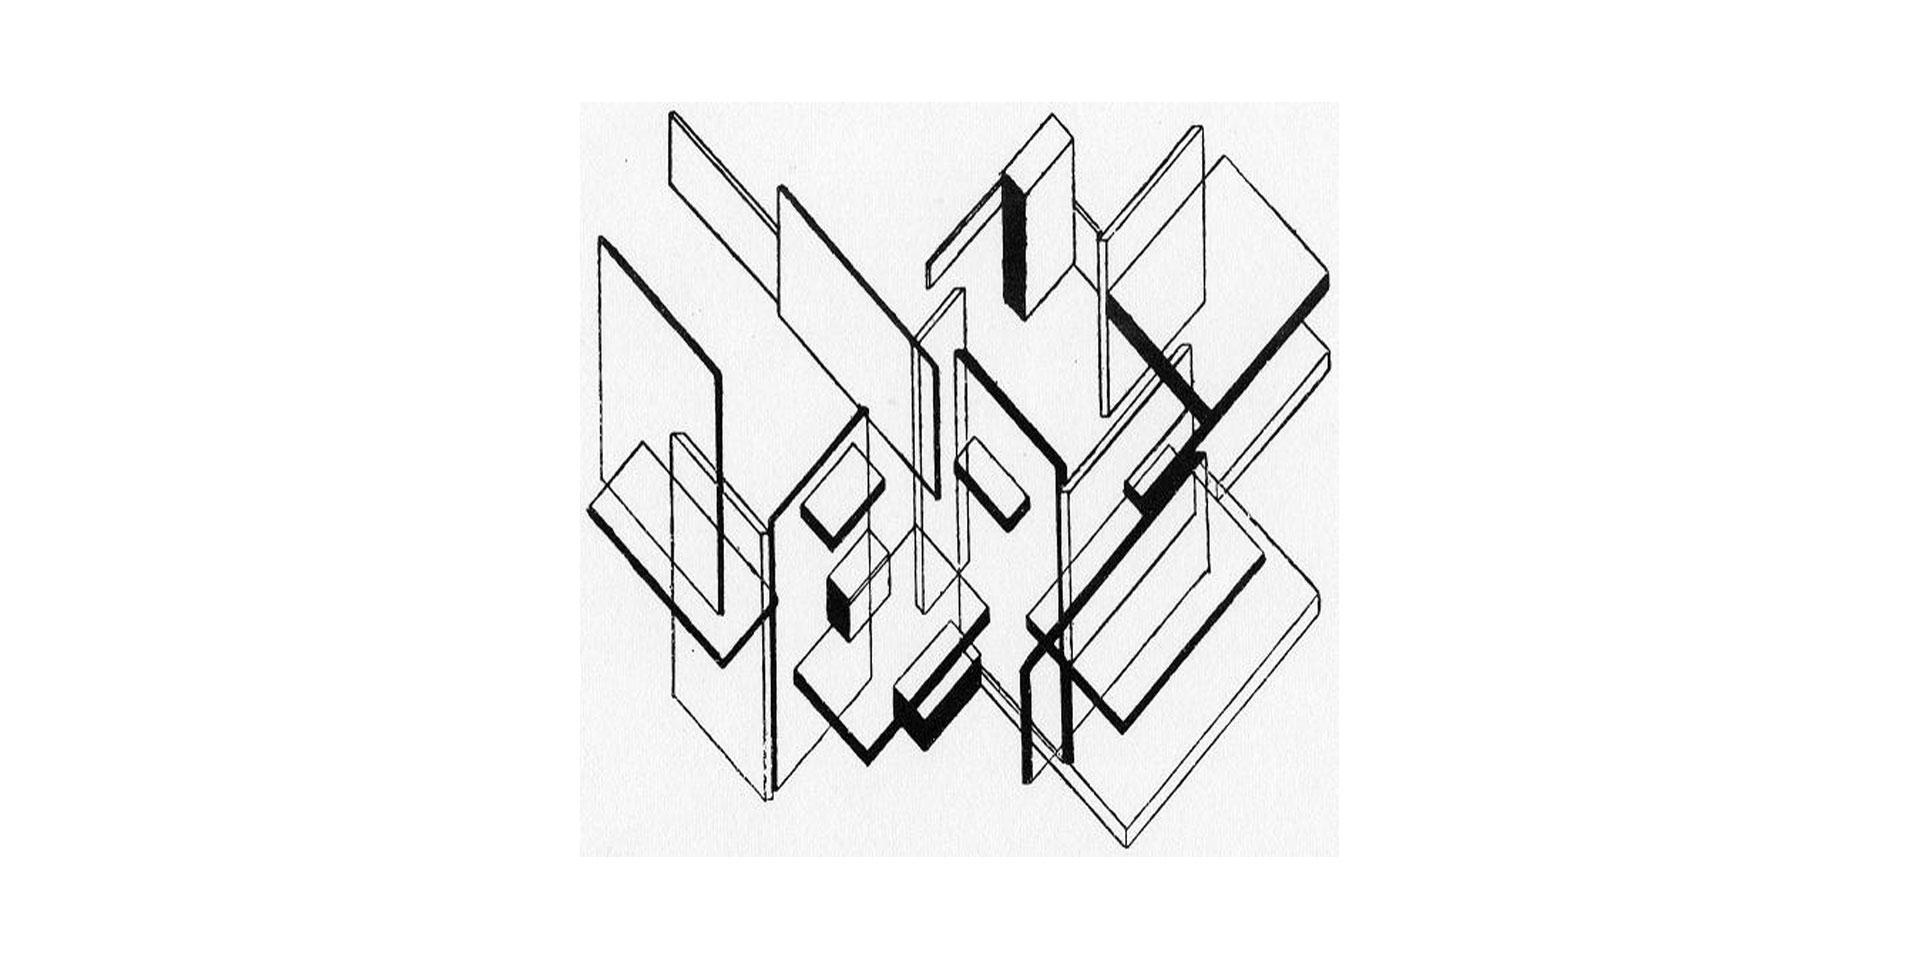 archinow_PYR_residenza-privata_02b